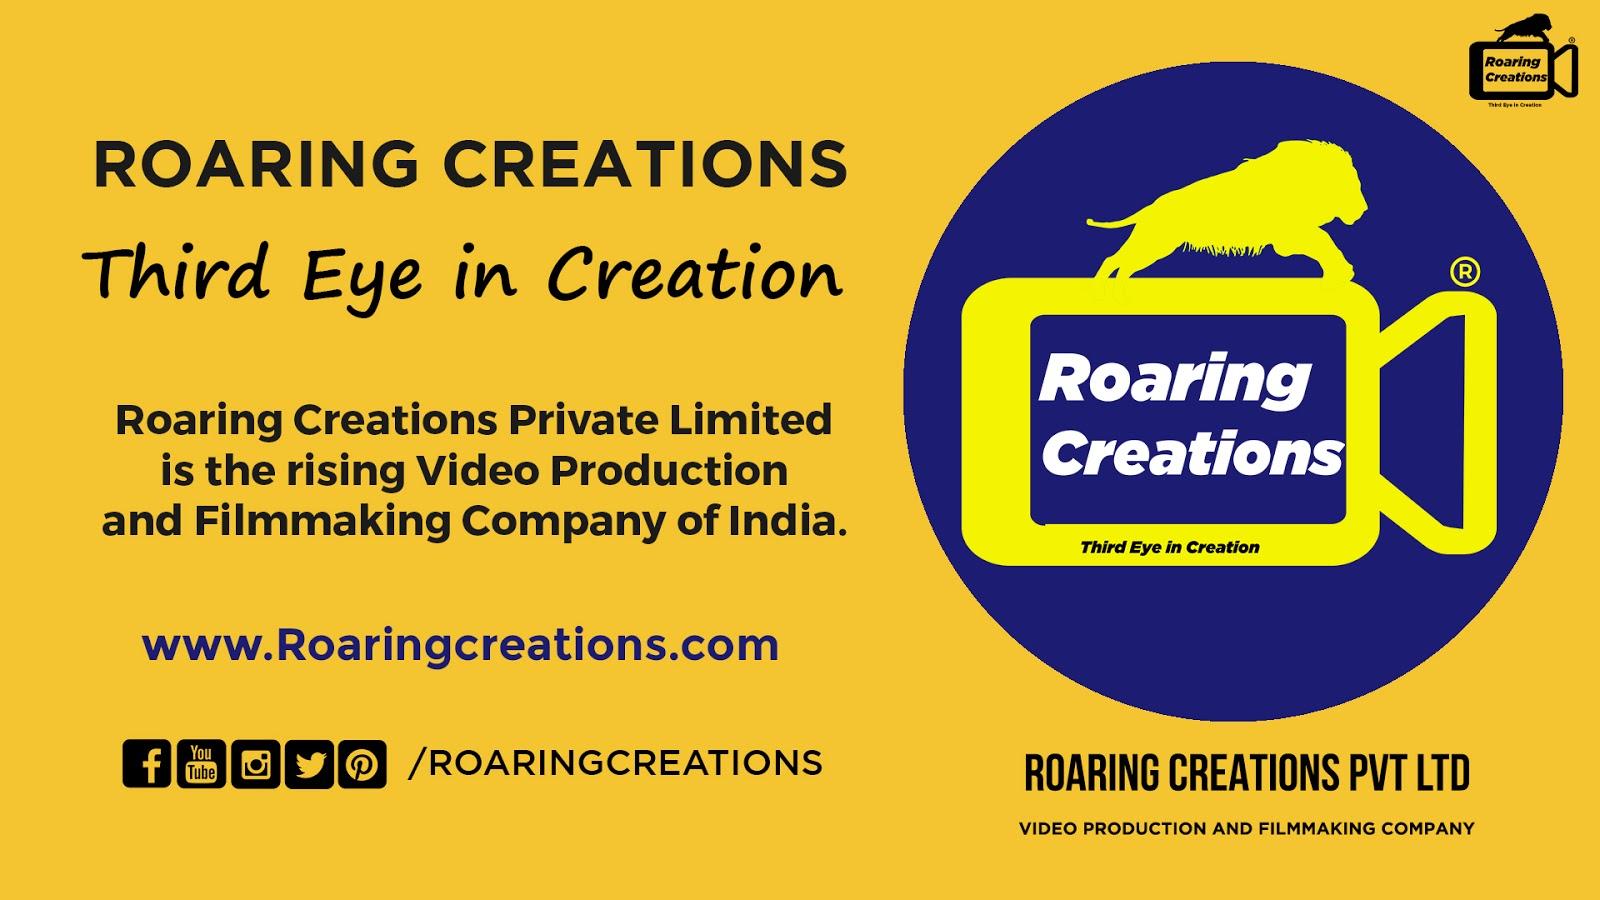 Roaring Creations